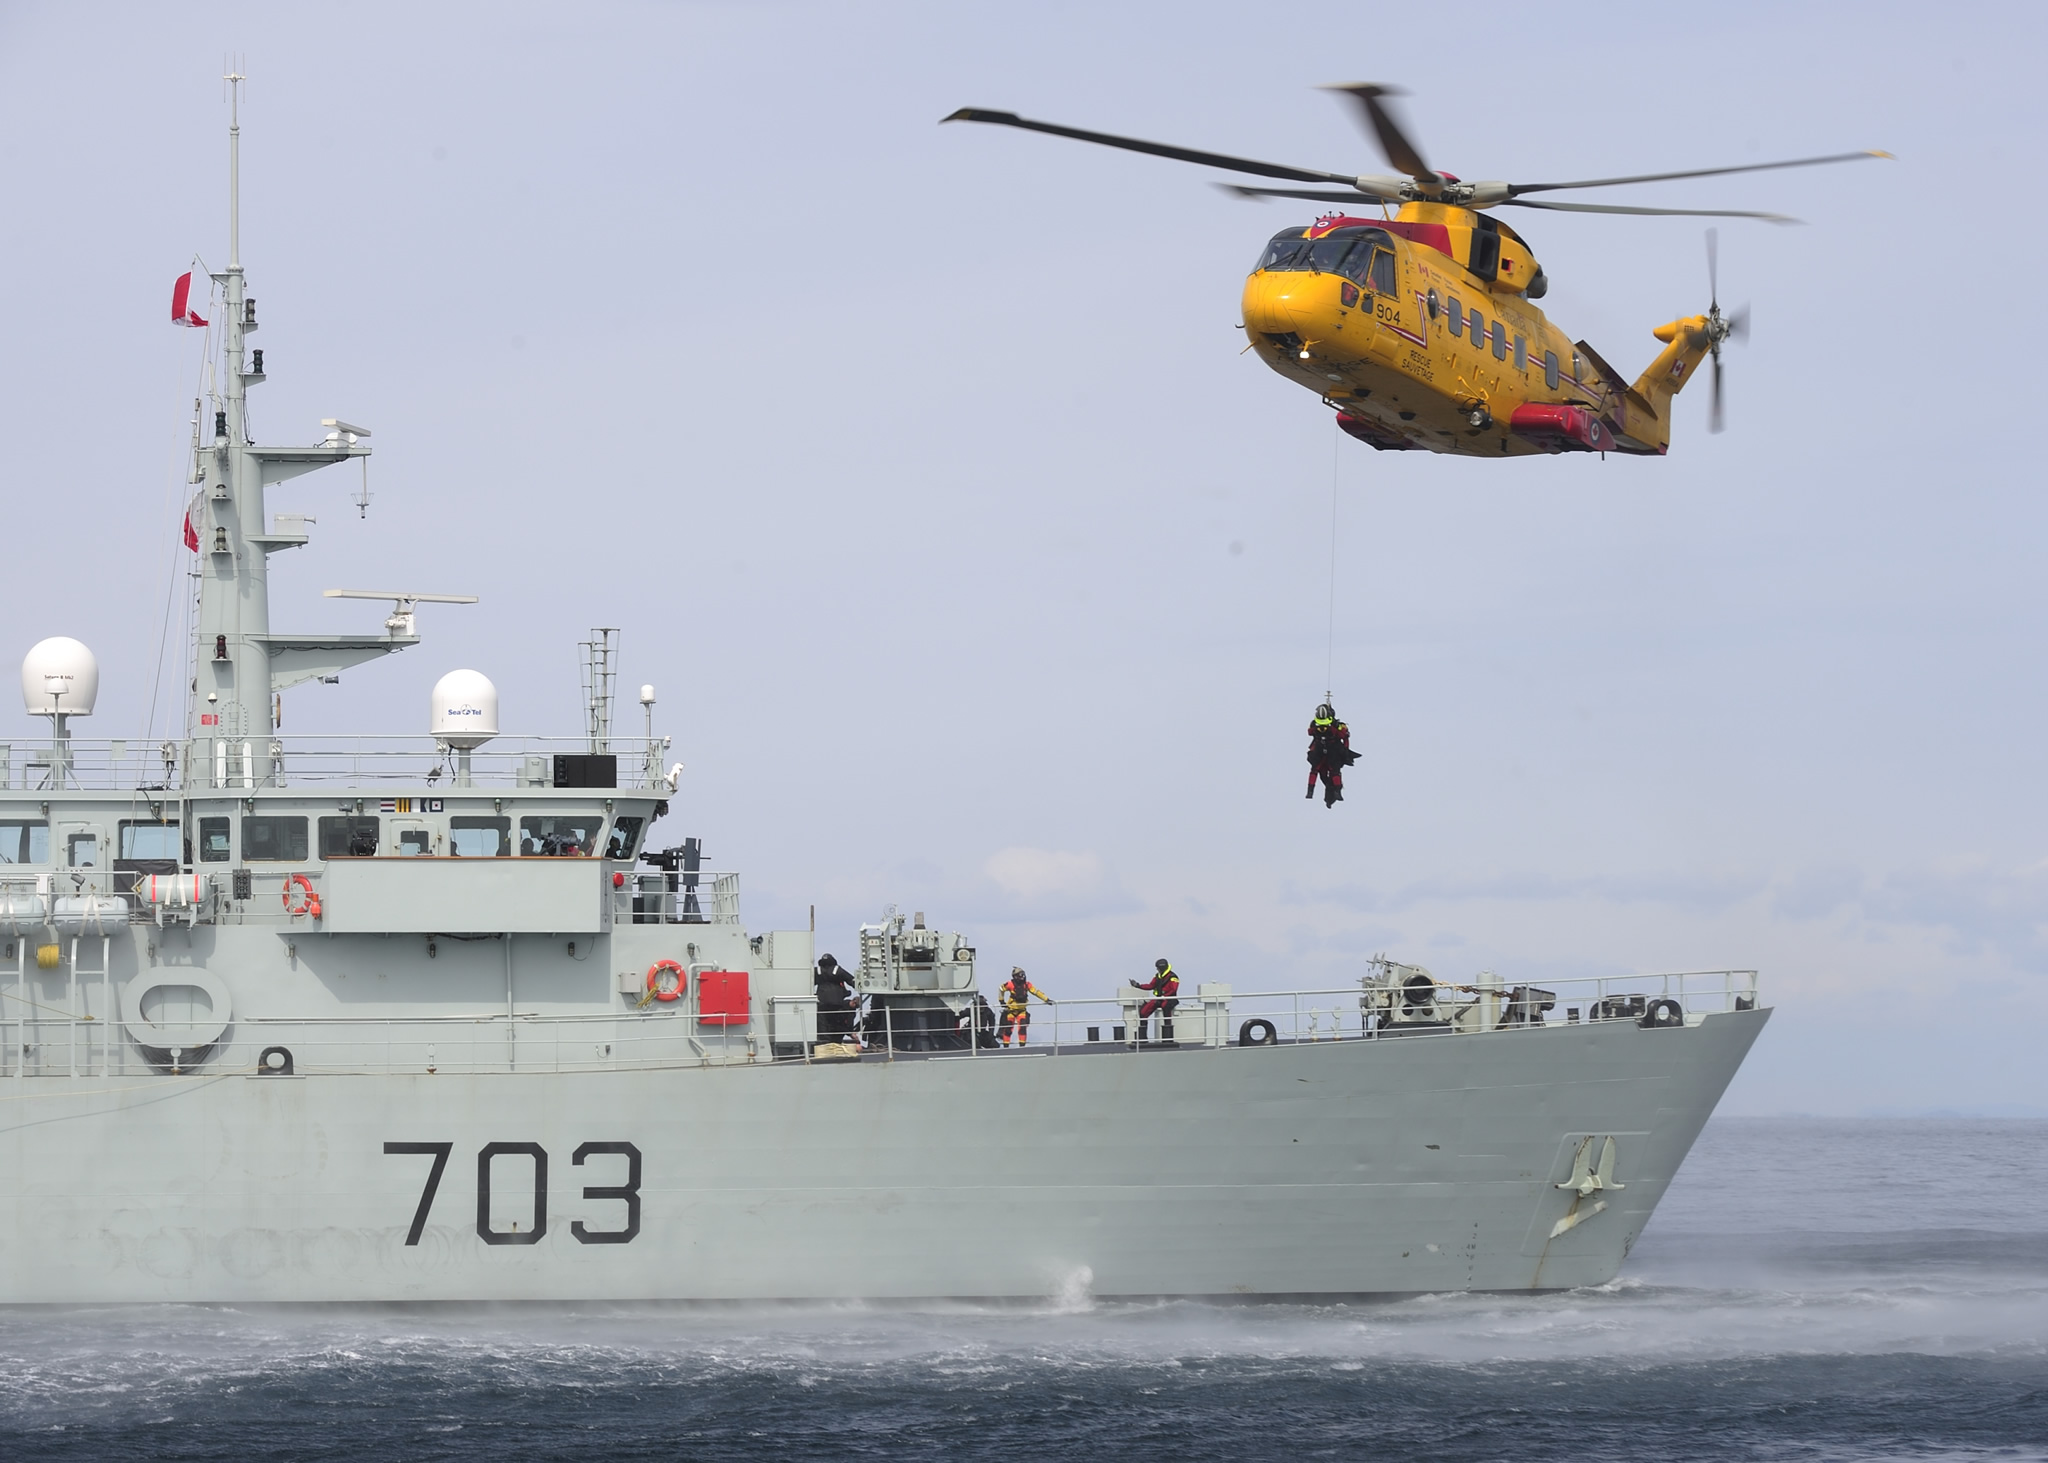 30 April 2013 A Royal Canadian Air Force Ch